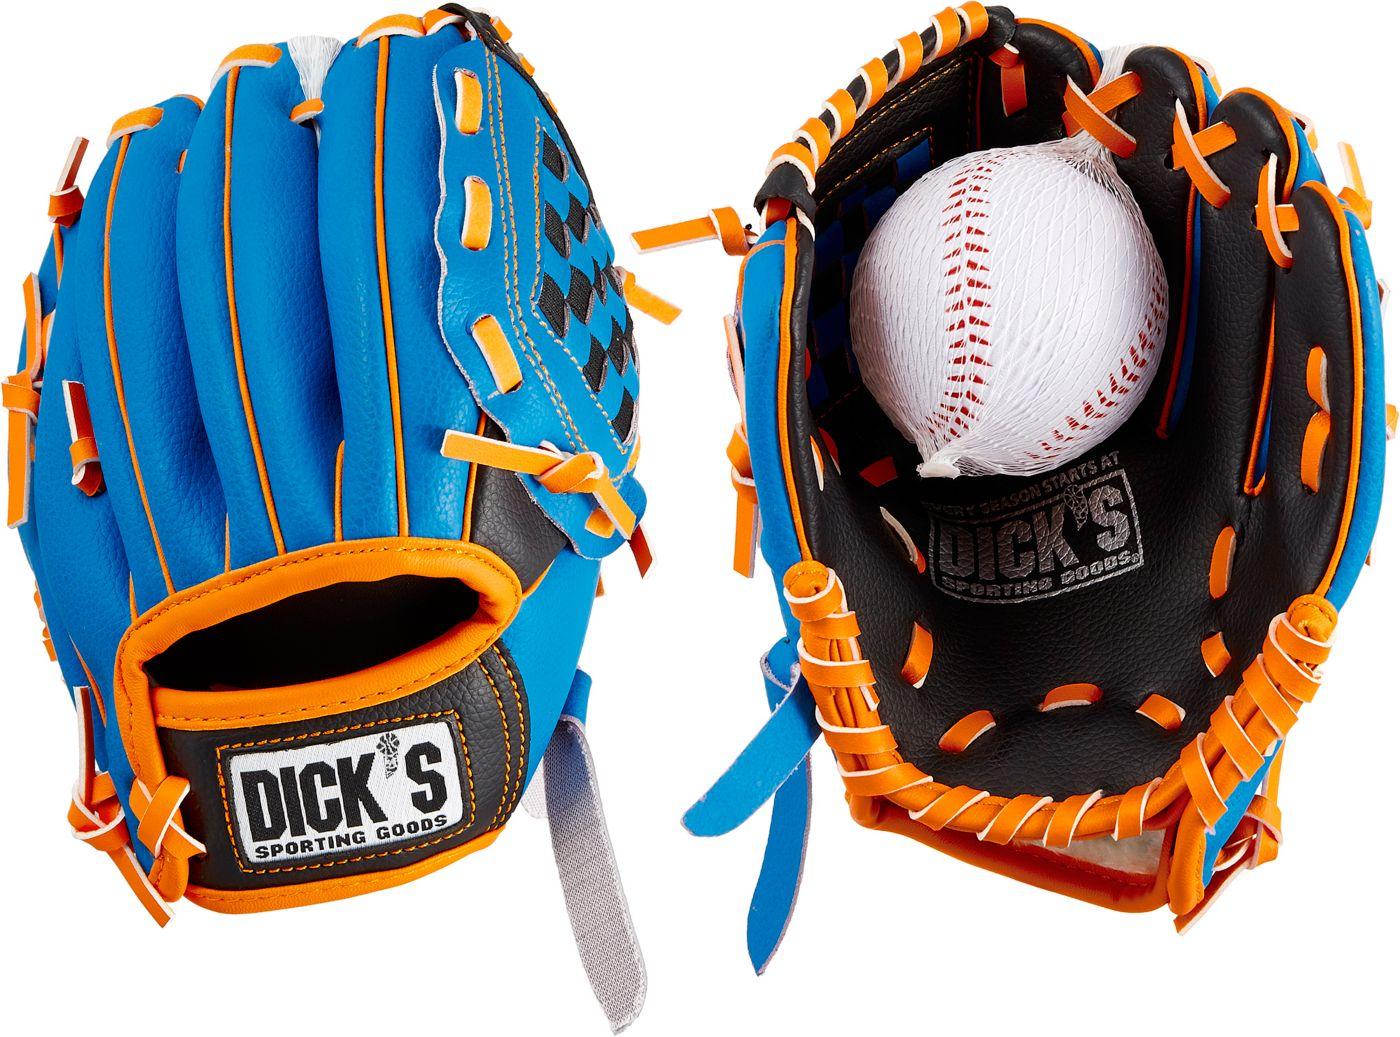 DICK'S Sporting Goods Backyard T-Ball Glove & Ball 2019